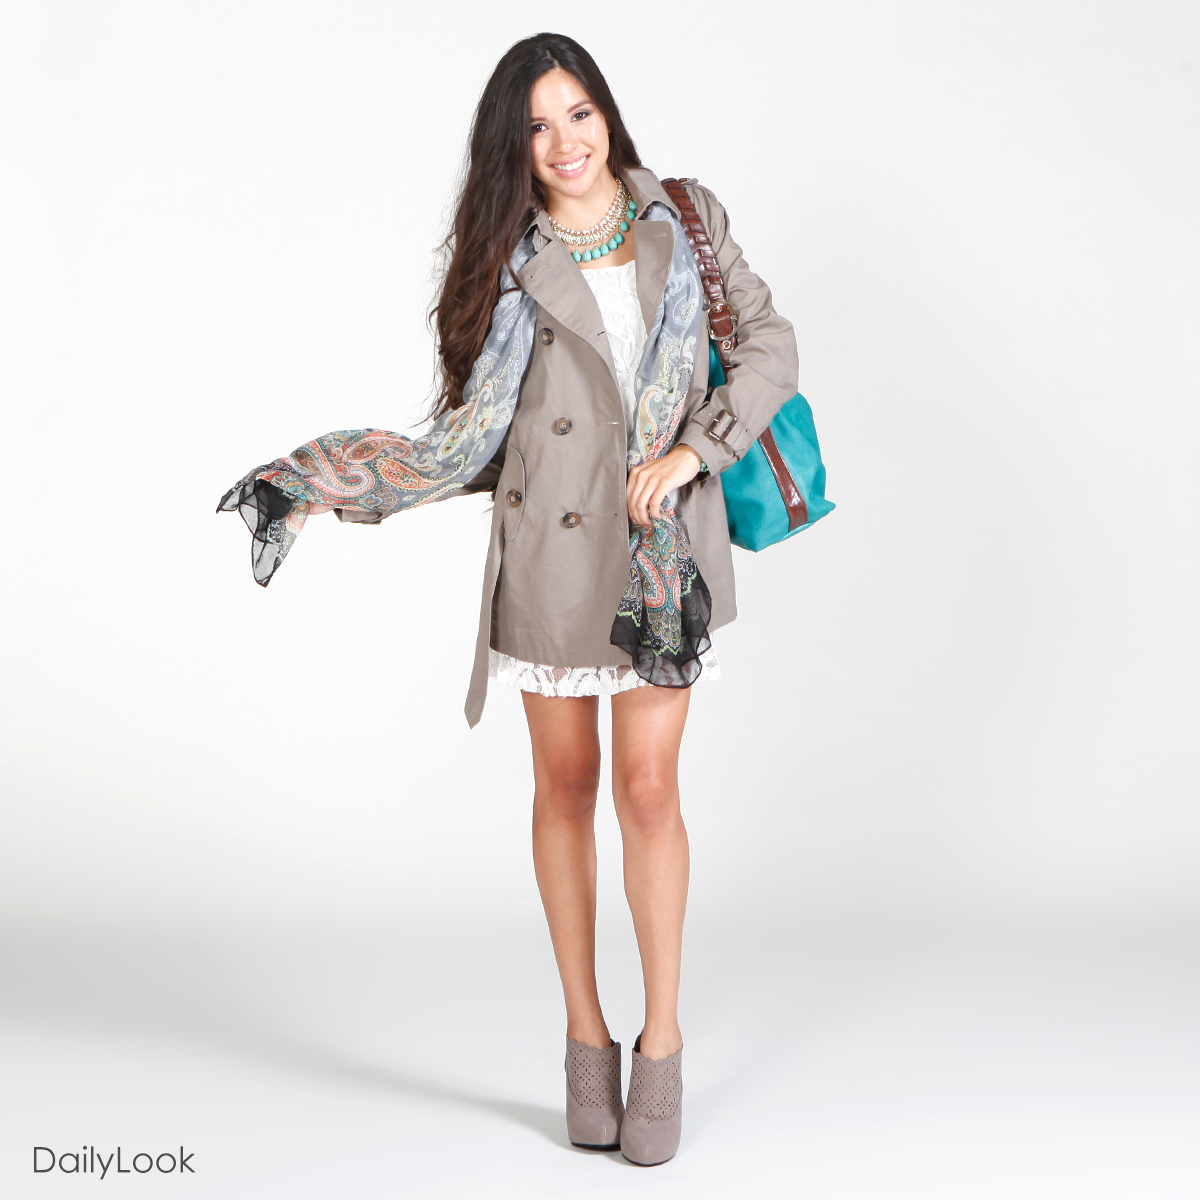 Lovelonglong Pet Clothing Wholsale Winter Dog Coats Ski Jacket Hoodies With Fur Hats Hot Sell